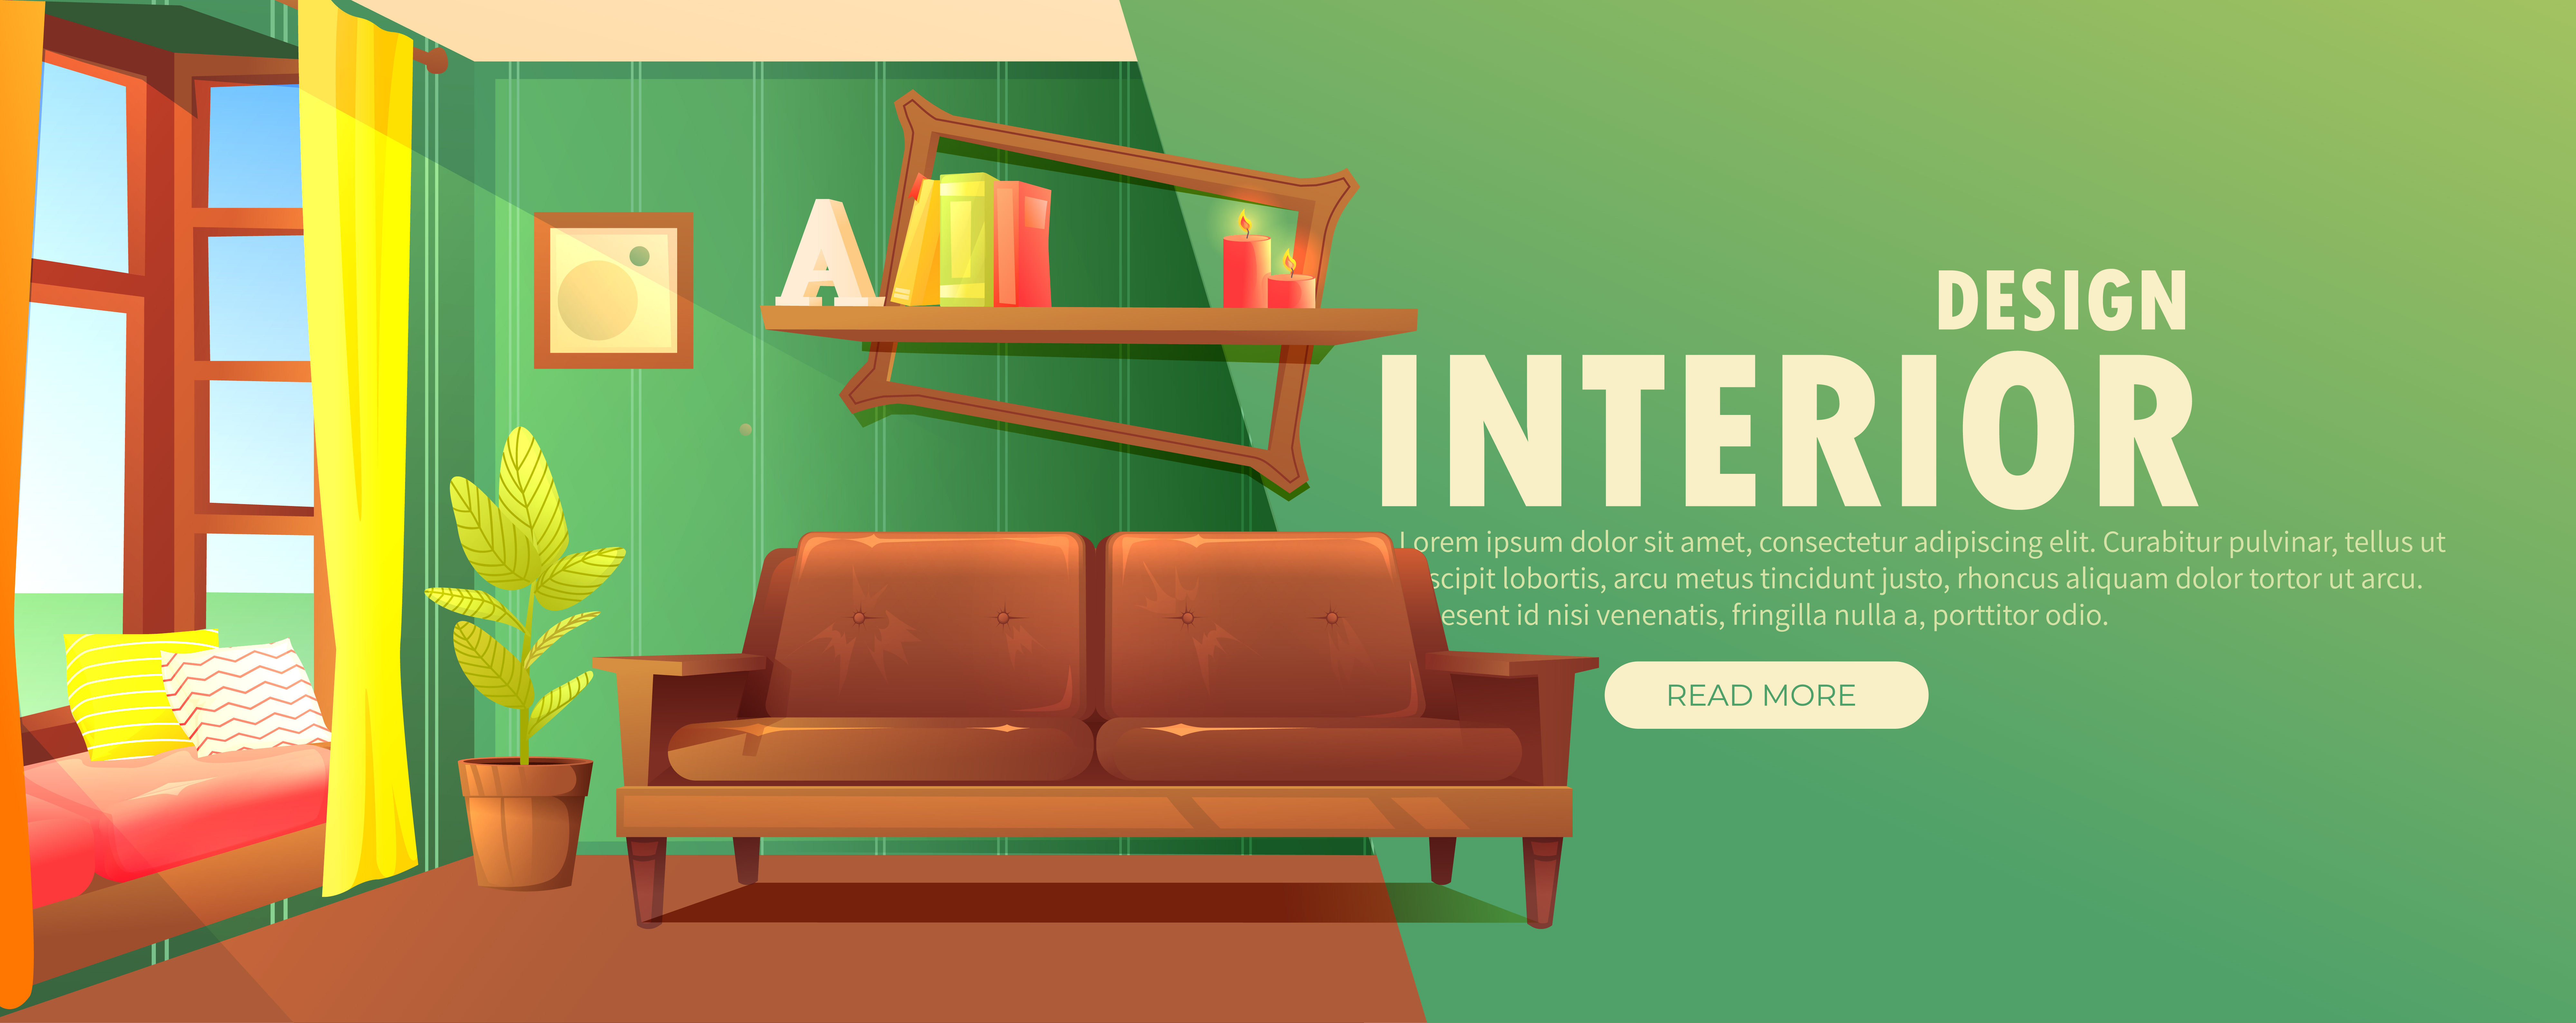 Interior Design Banner Retro Living Room With A Sofa And